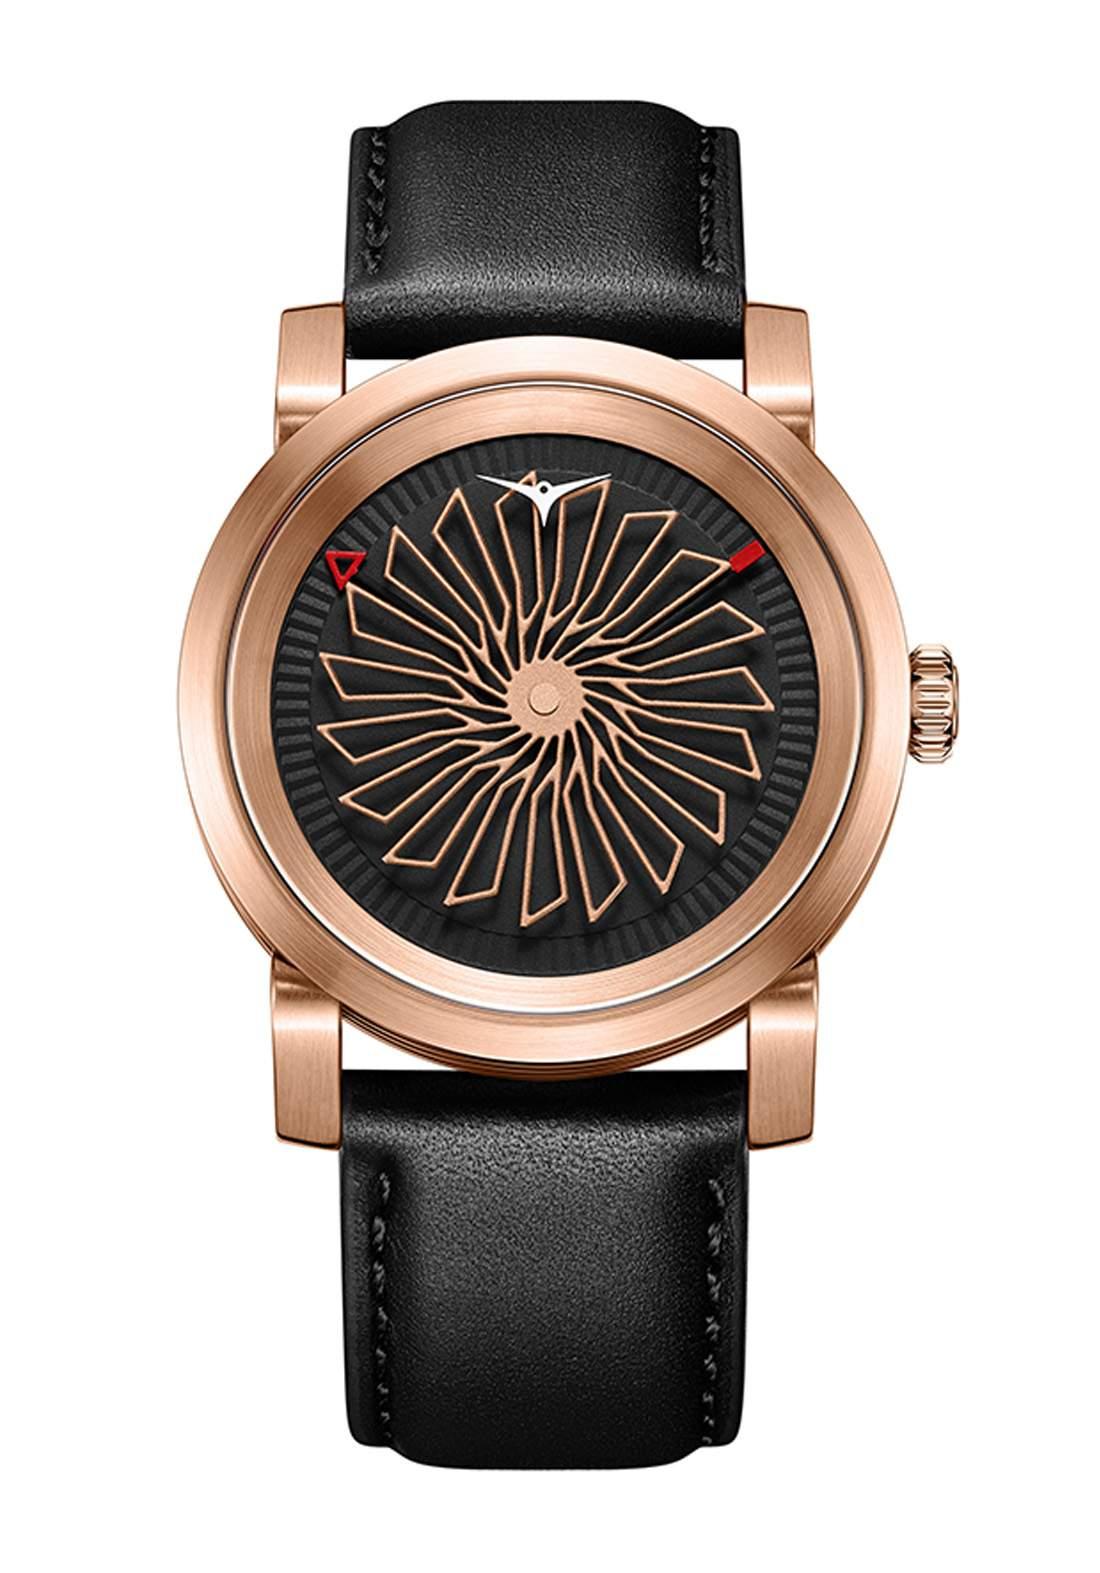 Zinvo Rival Rose Gold Watch For Women  ساعة نسائي